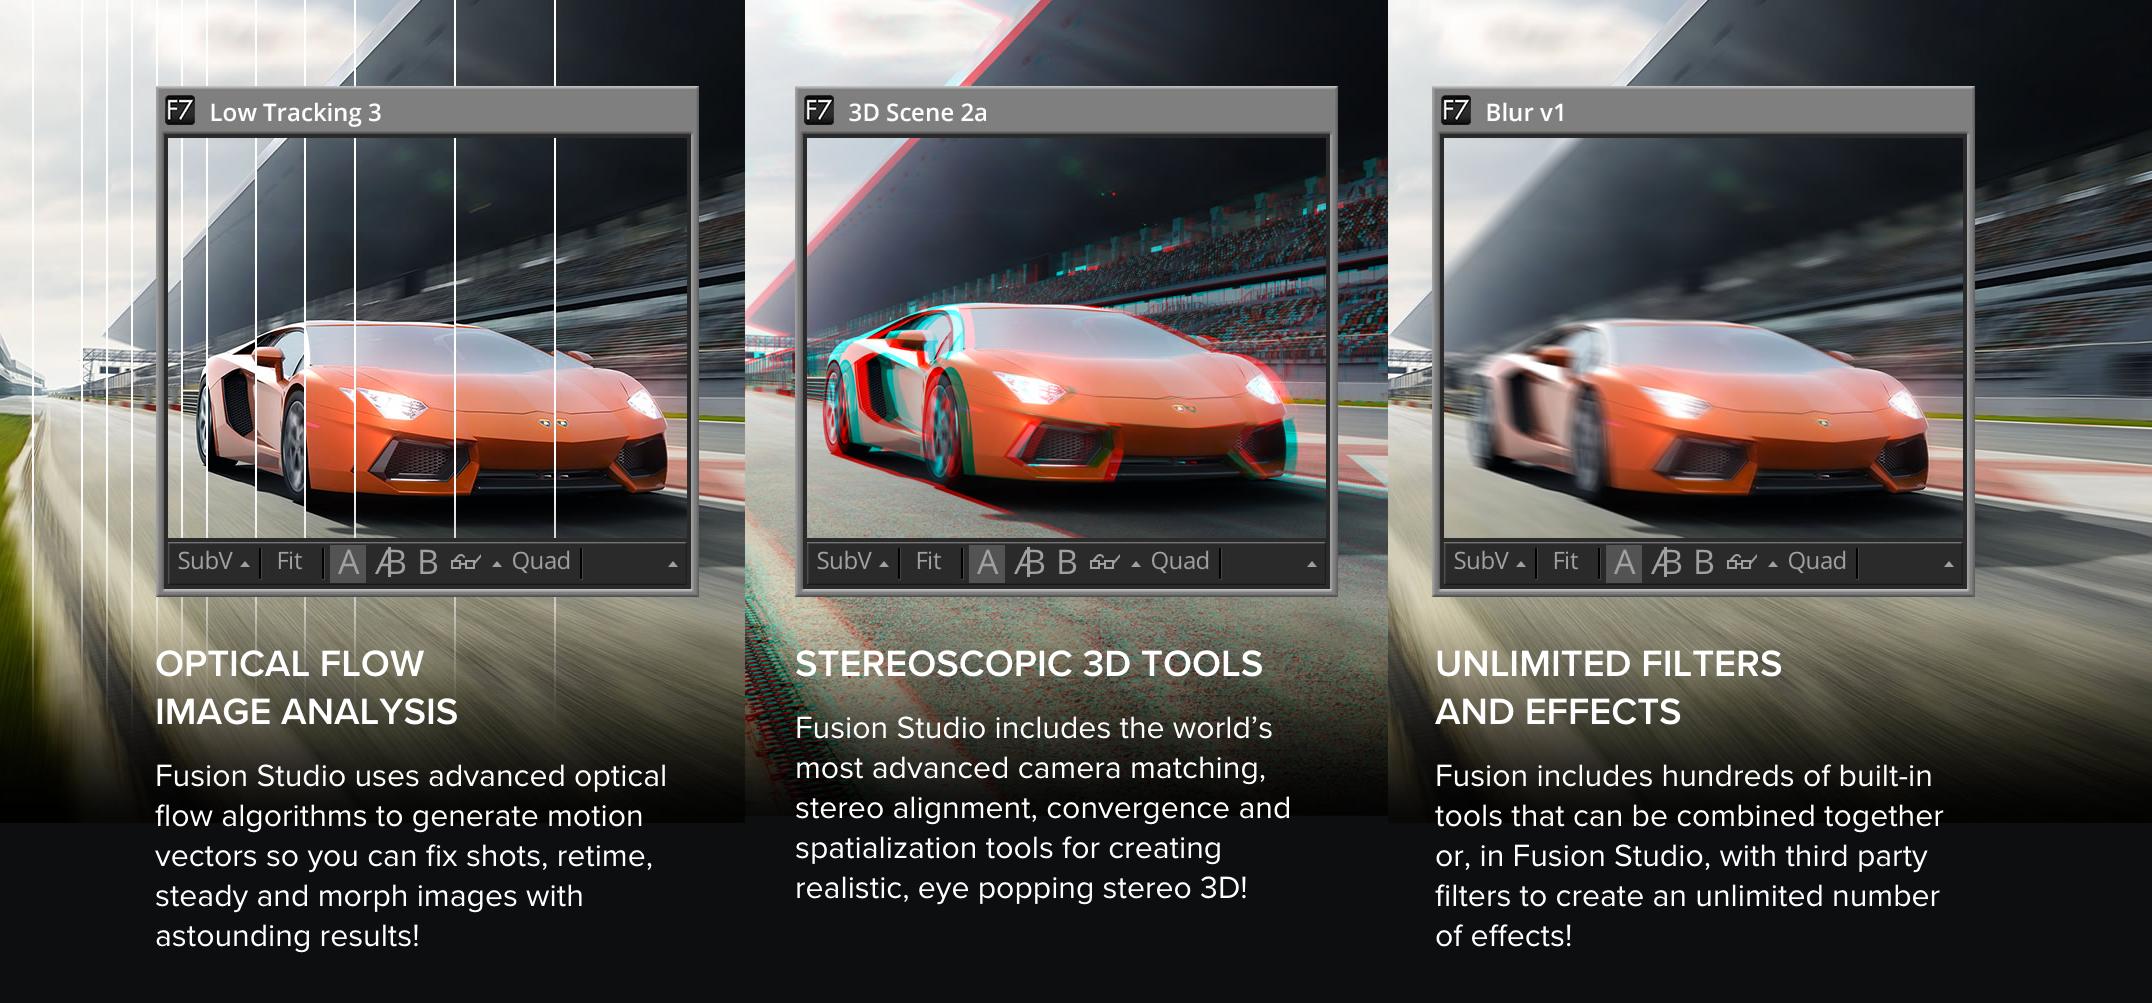 Stereoscopic-3D-Tools